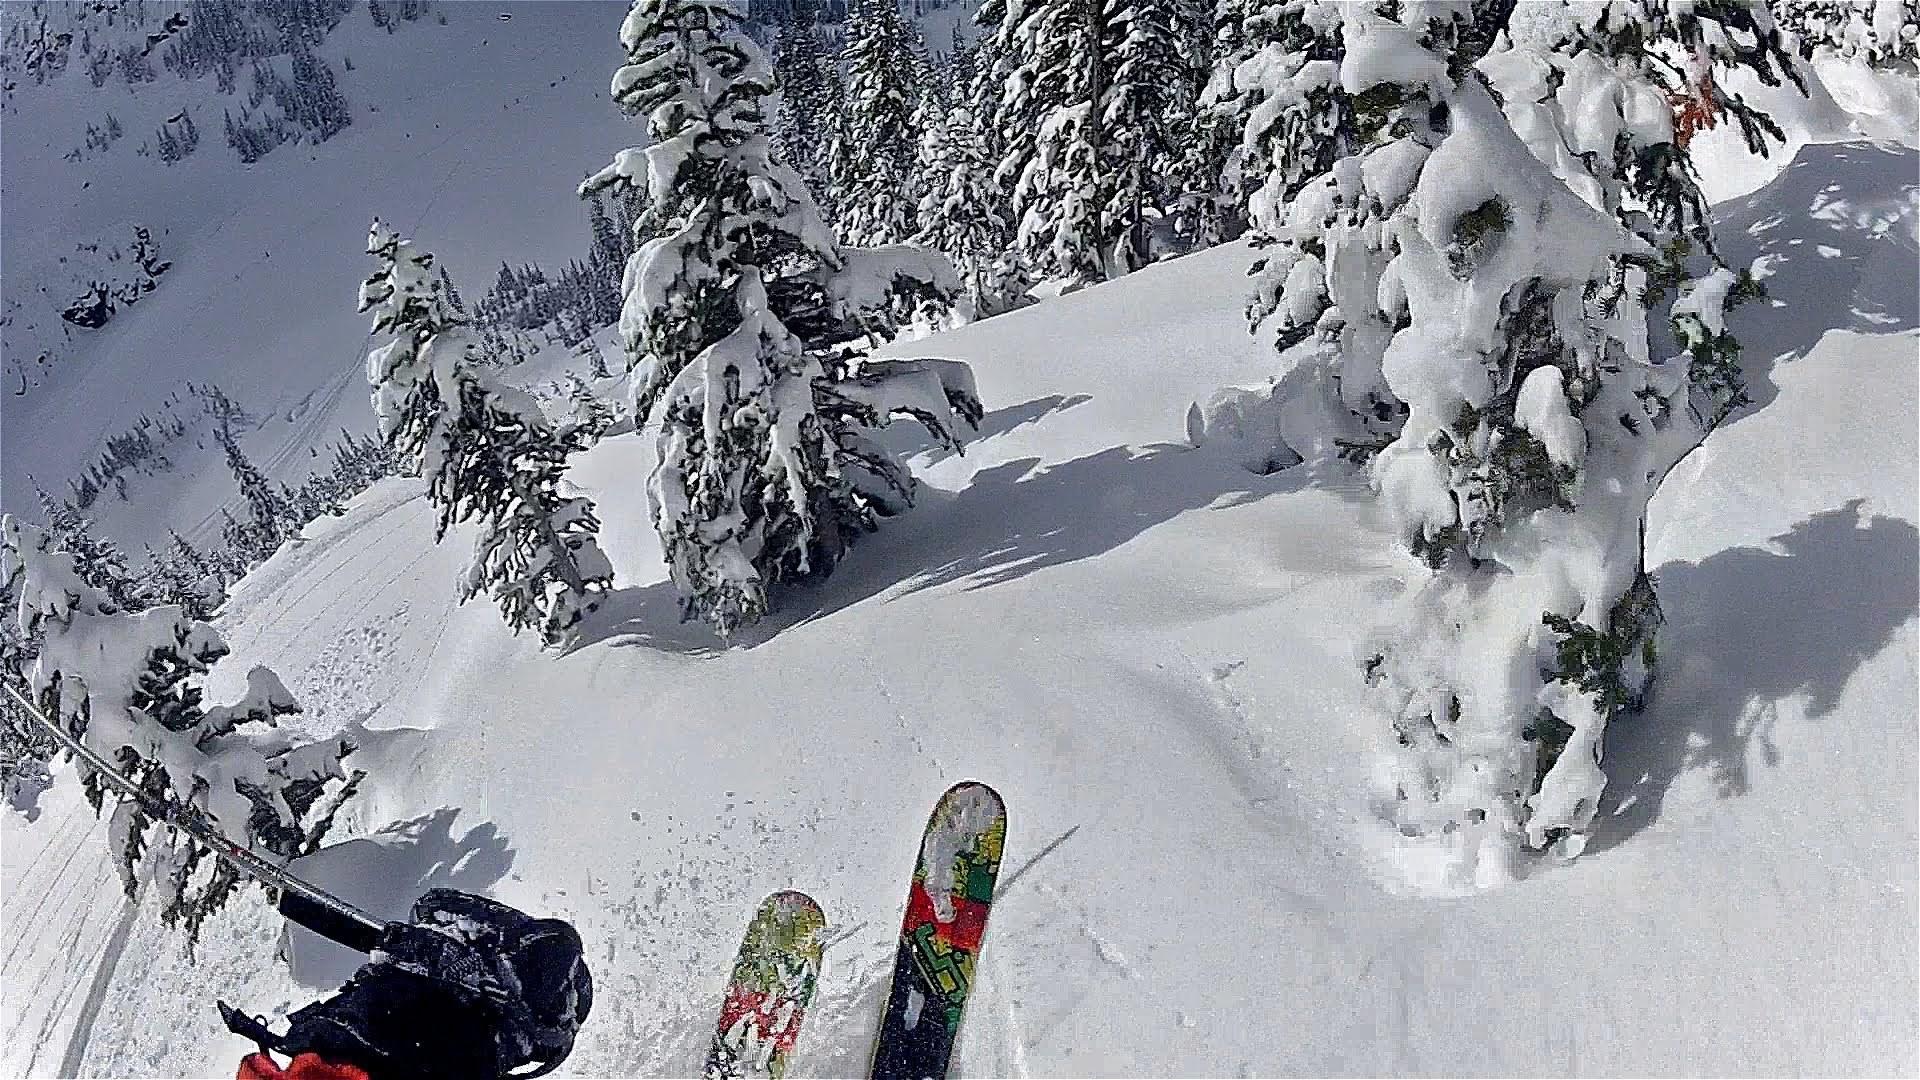 Skiing Sport Wallpaper Iphone: Skiing Ski Winter Snow Sports Mountain Wallpaper